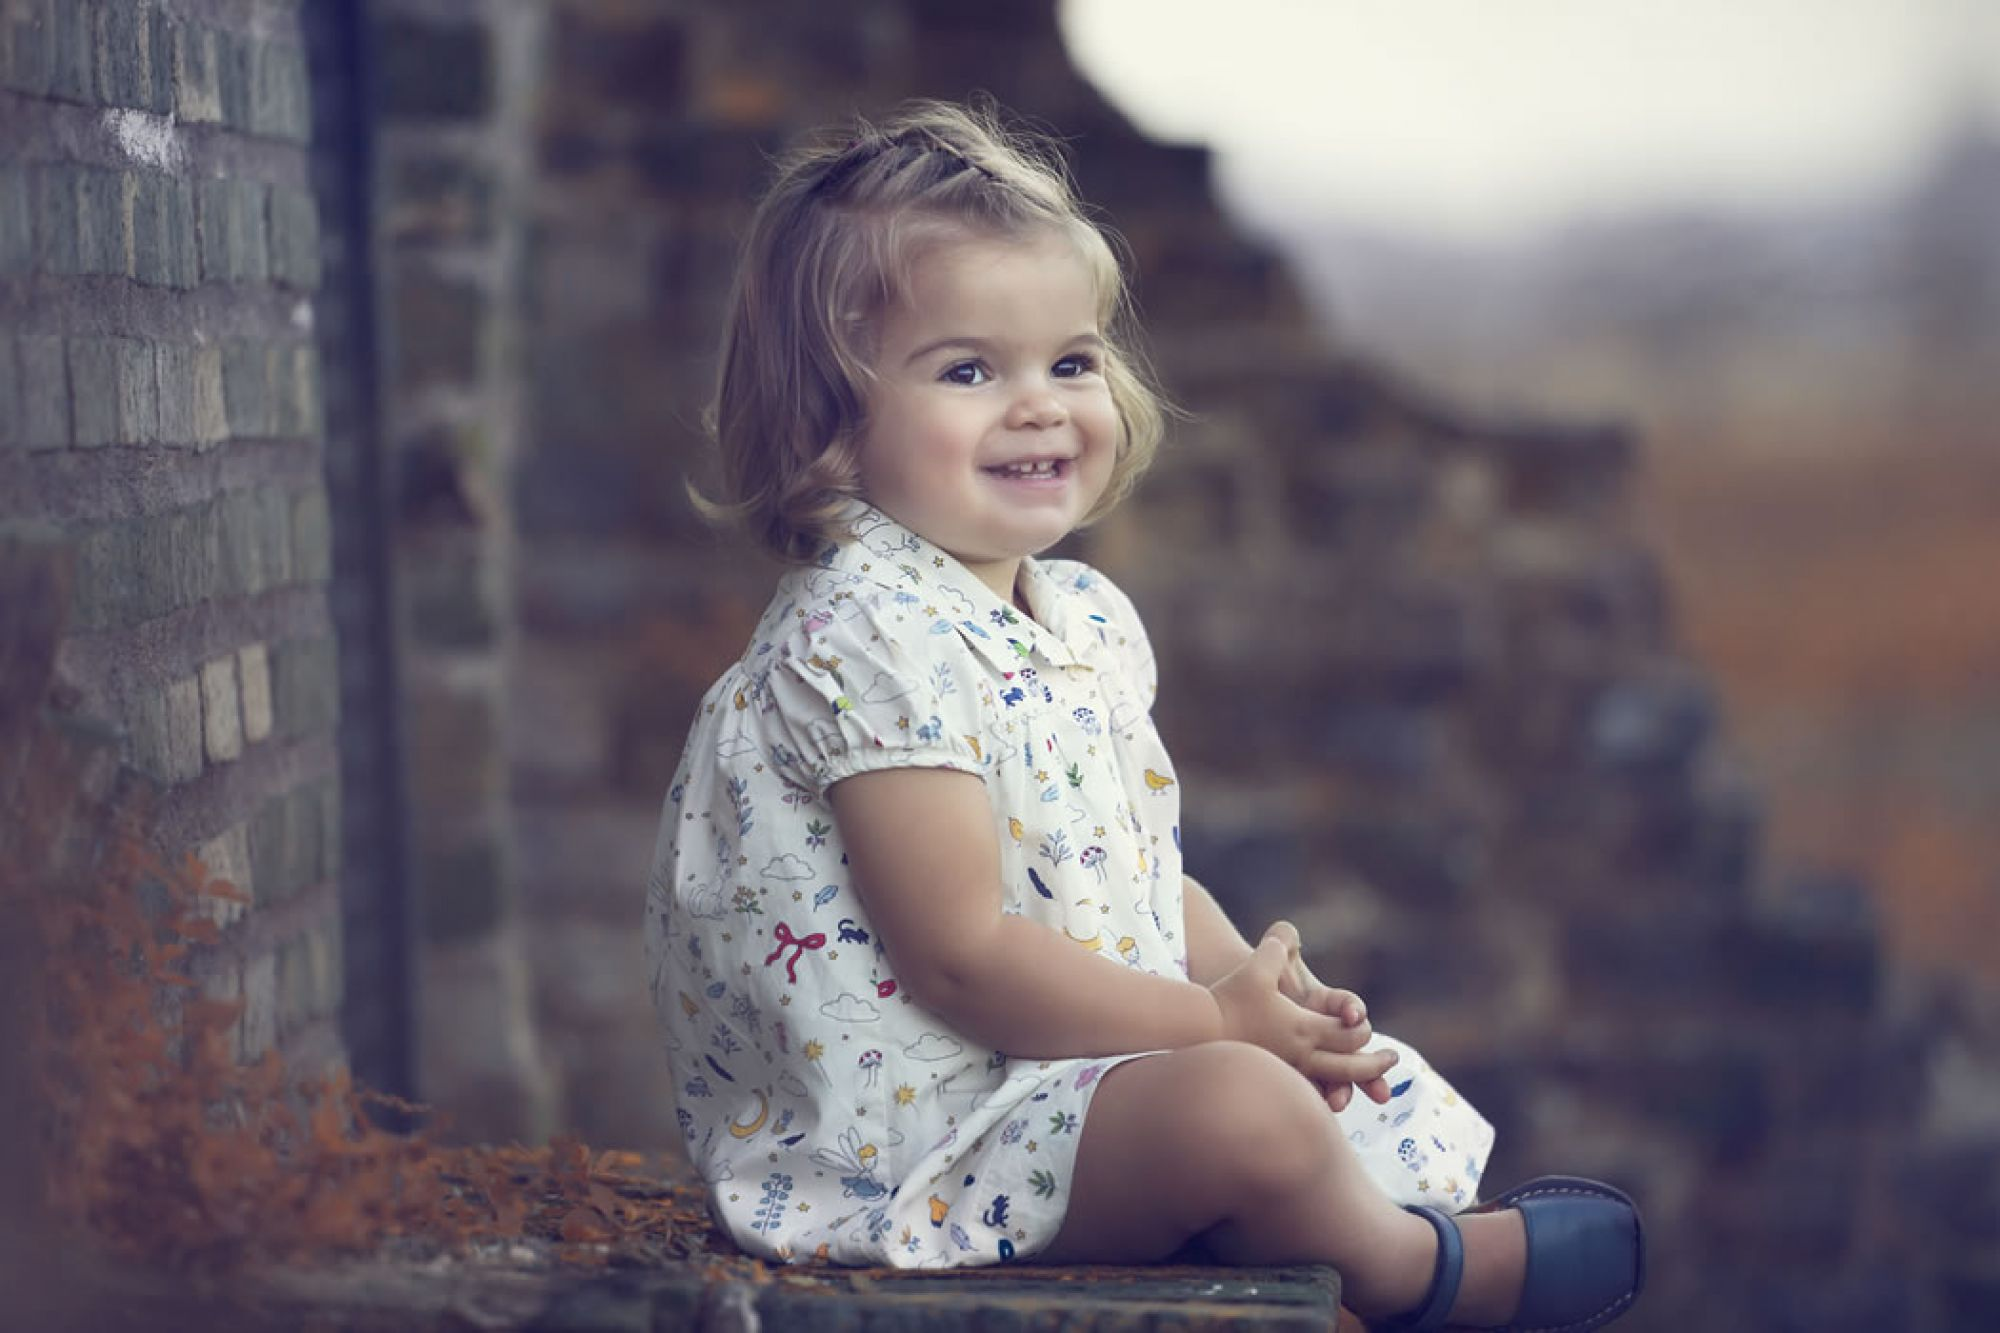 Reportaje fotos niños Bizkaia